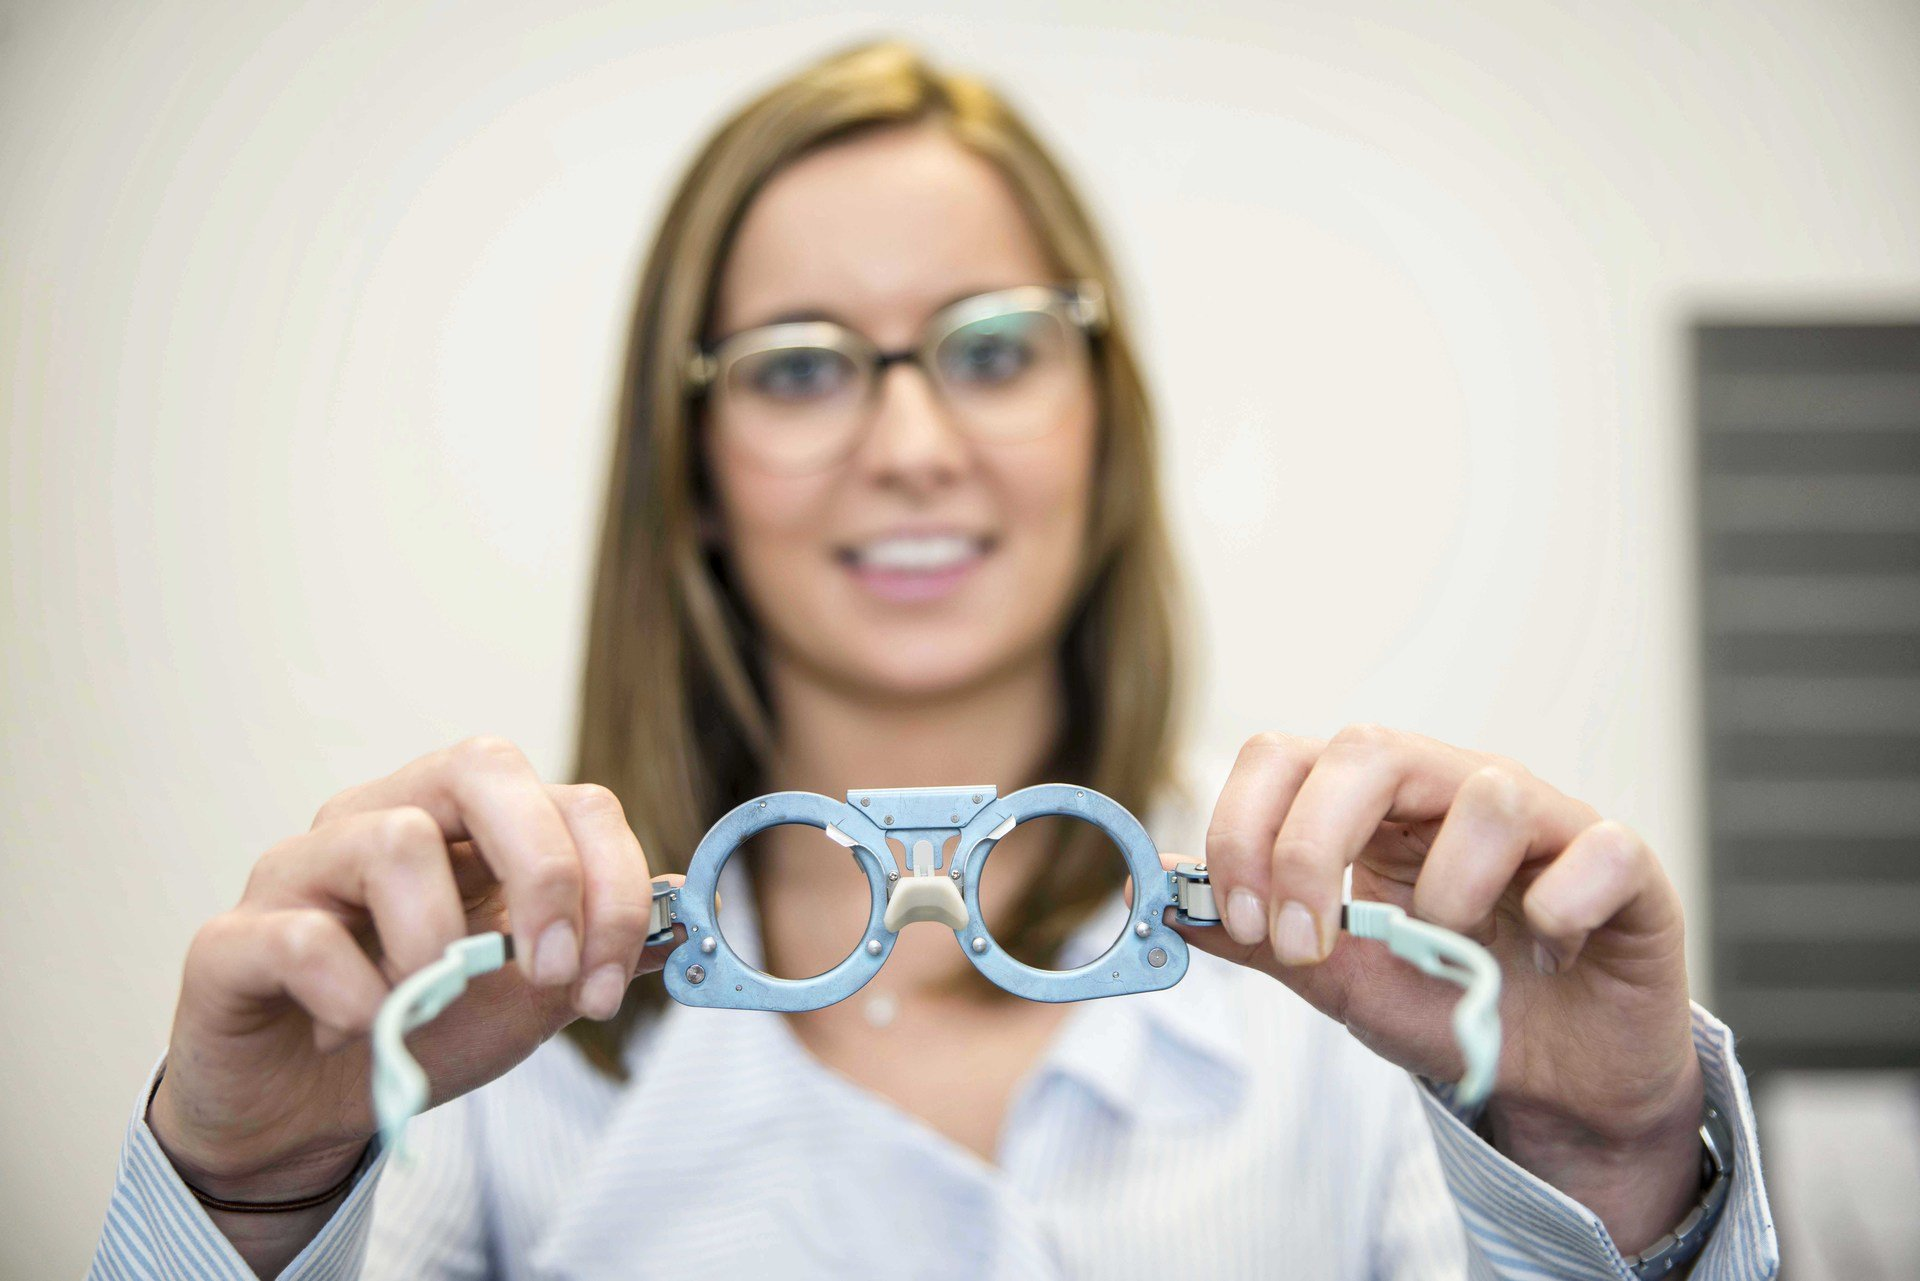 Optometrist with glasses